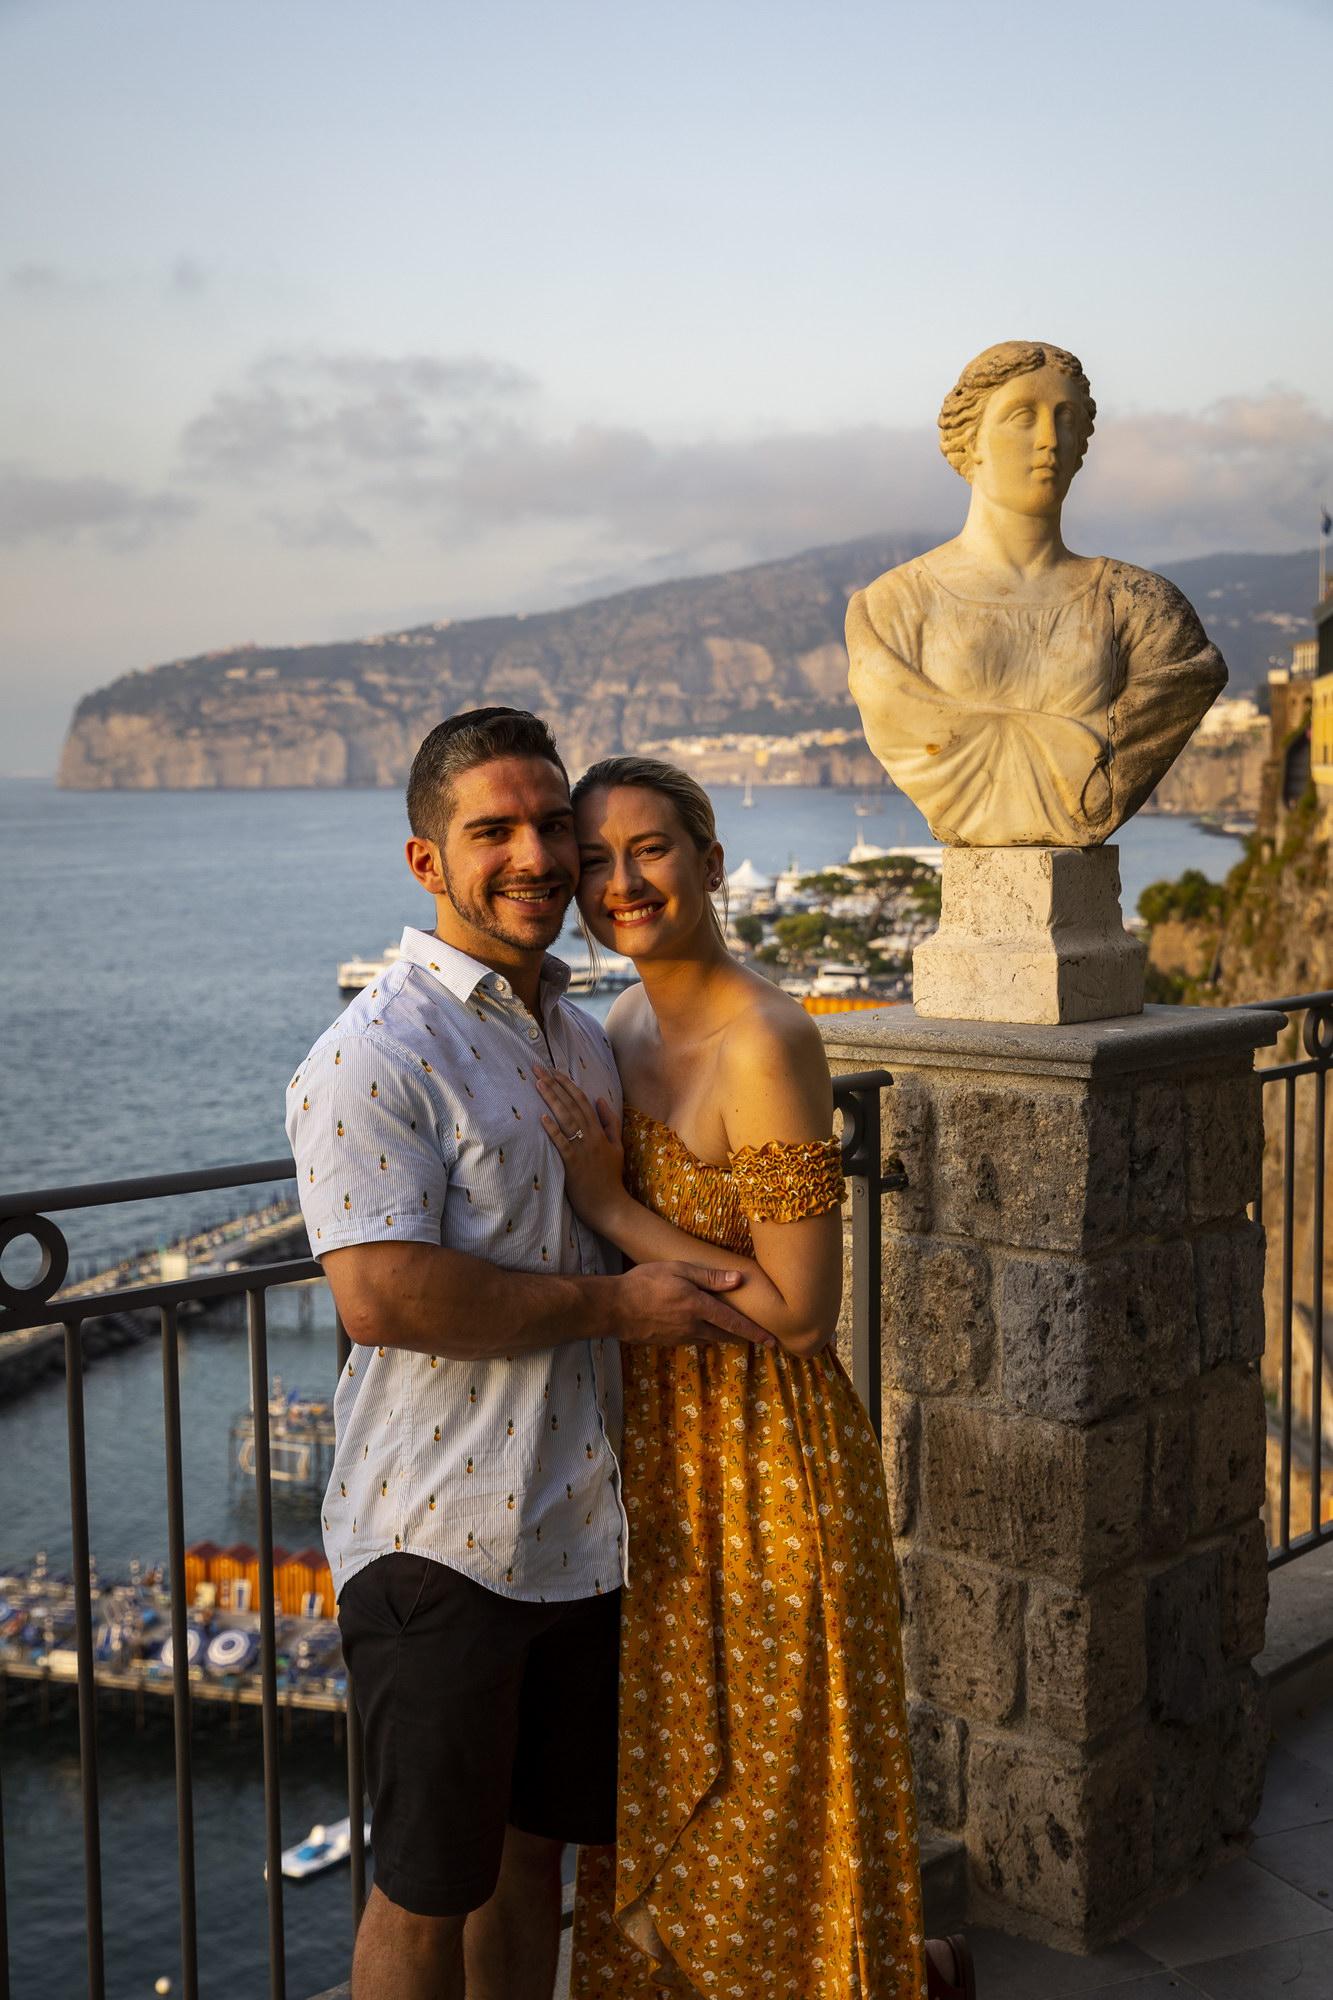 Seaside Engagement in Sorrento Andrea Matone09